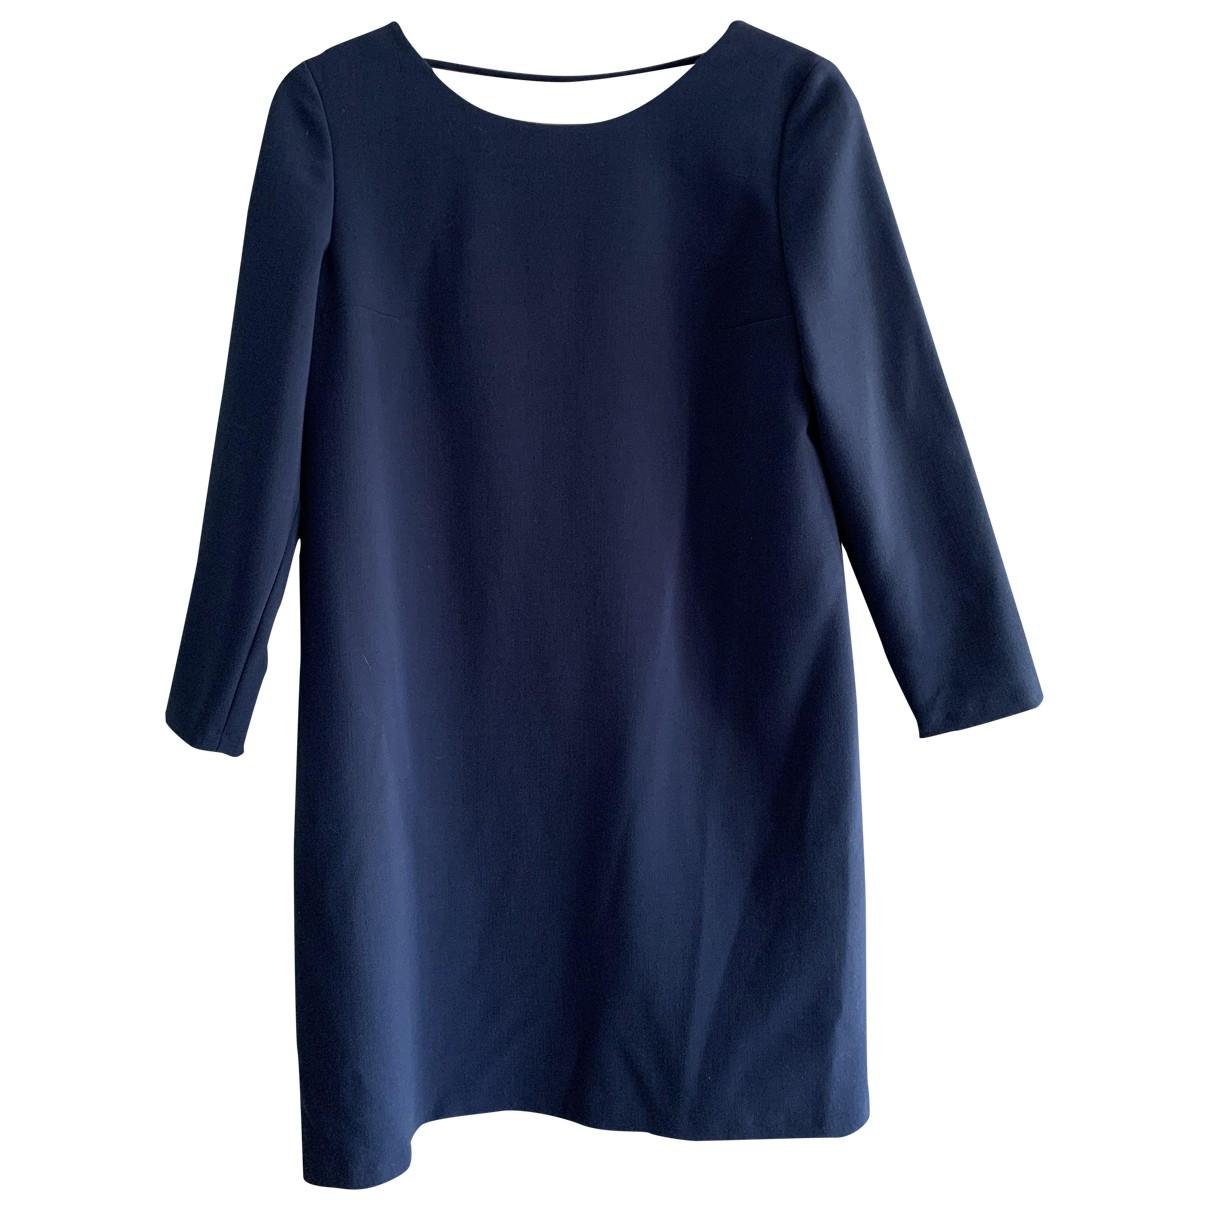 Ba&sh \N Blue dress for Women M International